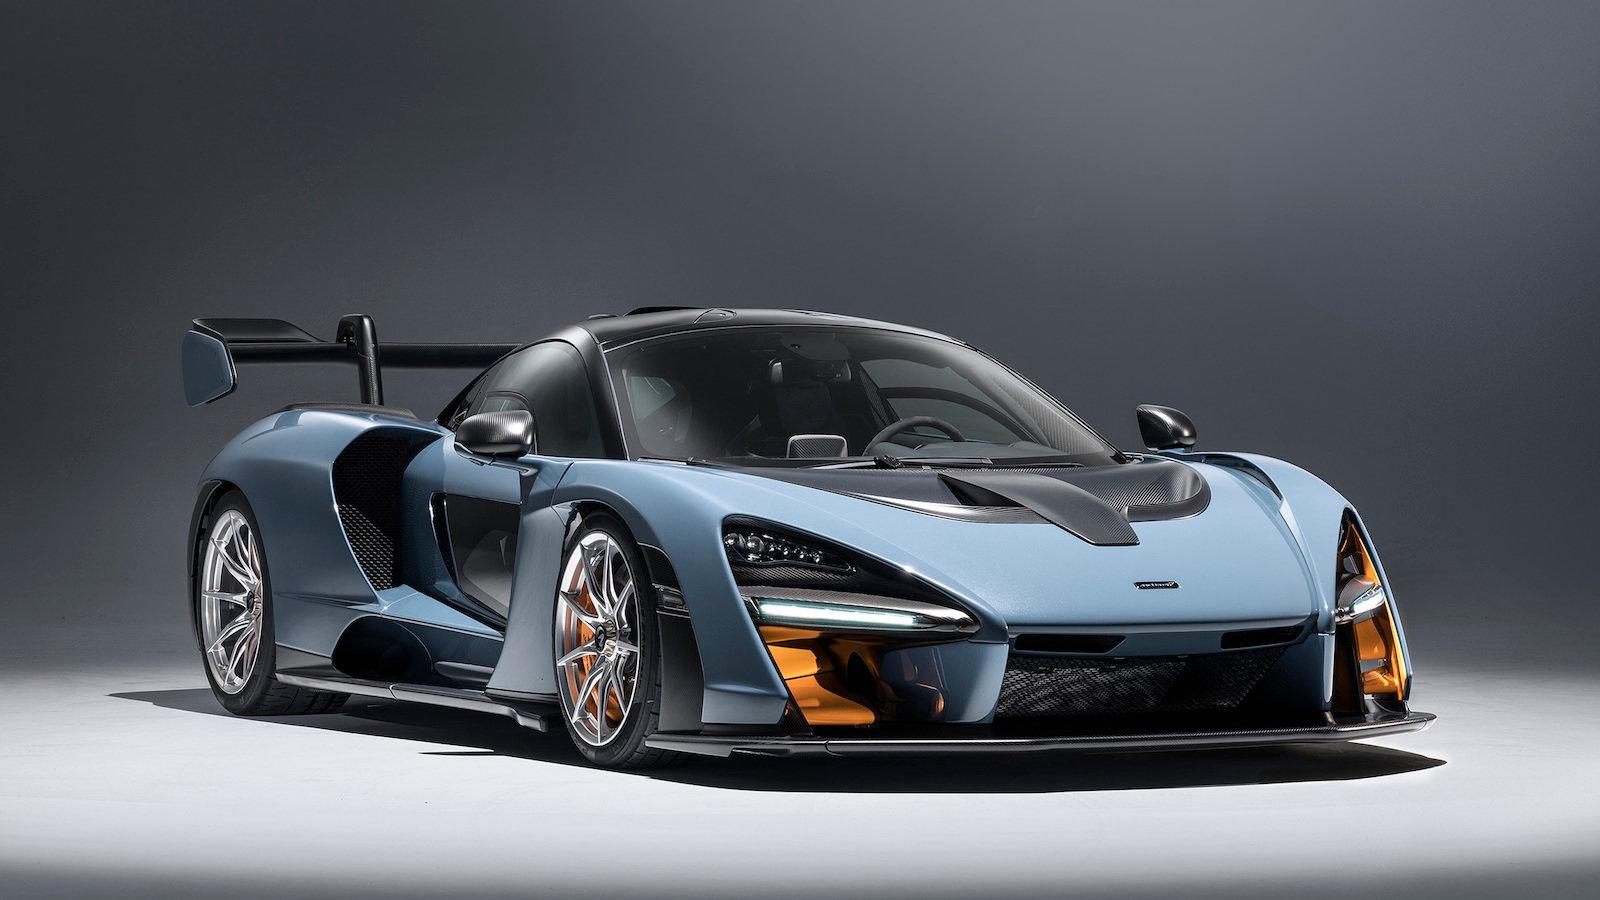 McLaren's Newest EV Supercar is Ready...Sort Of